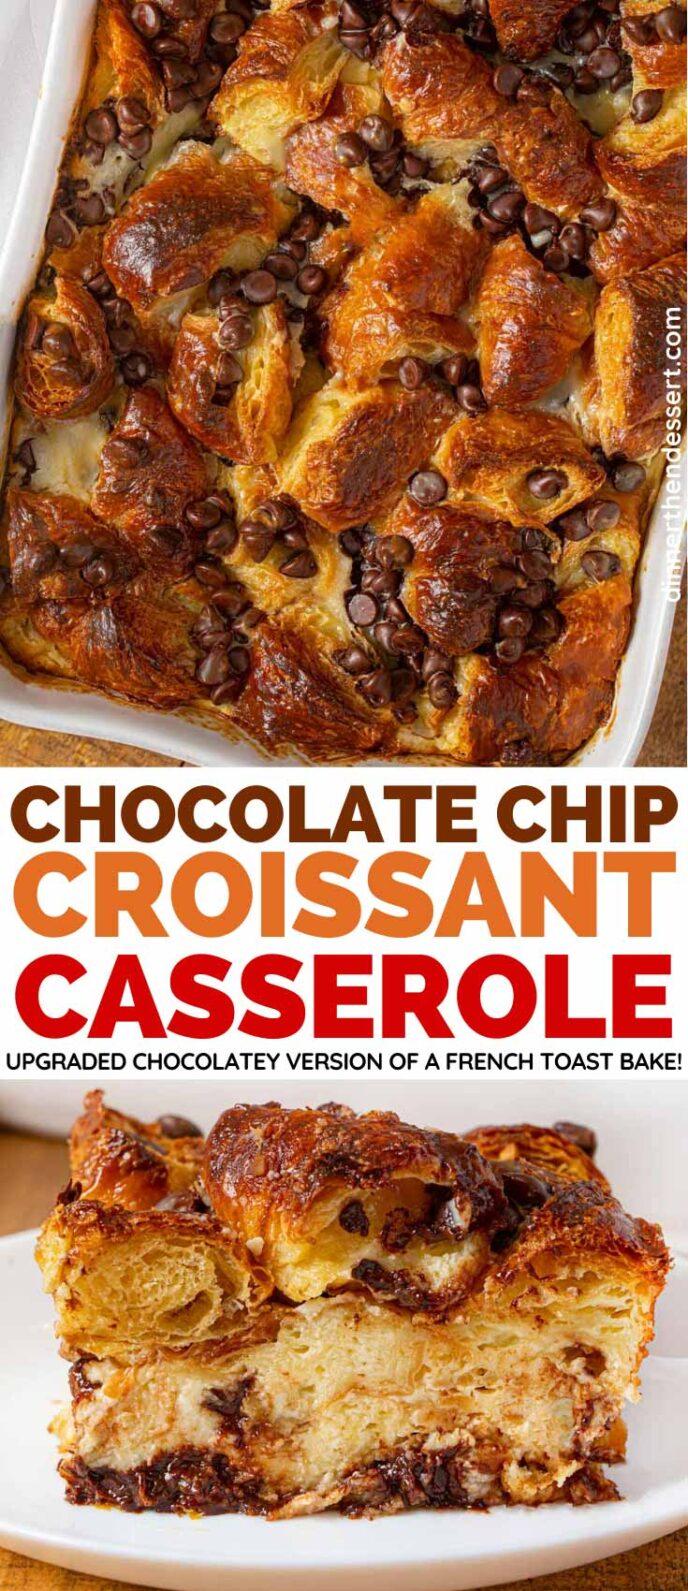 Chocolate Chip Croissant Casserole collage